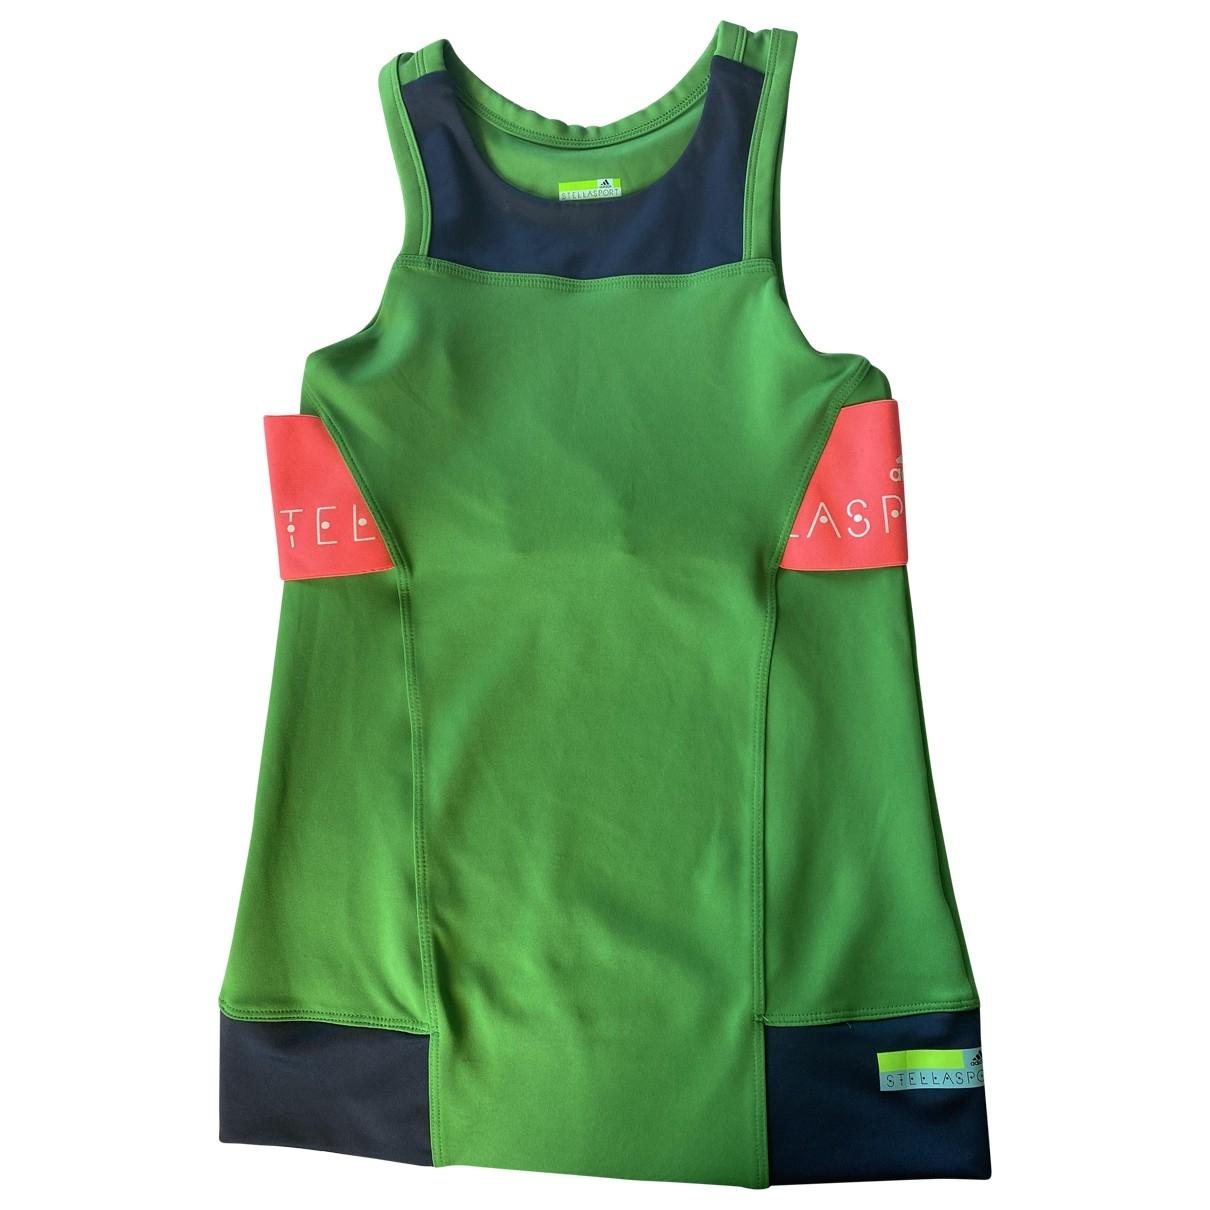 Camiseta sin mangas Stella Mccartney Pour Adidas